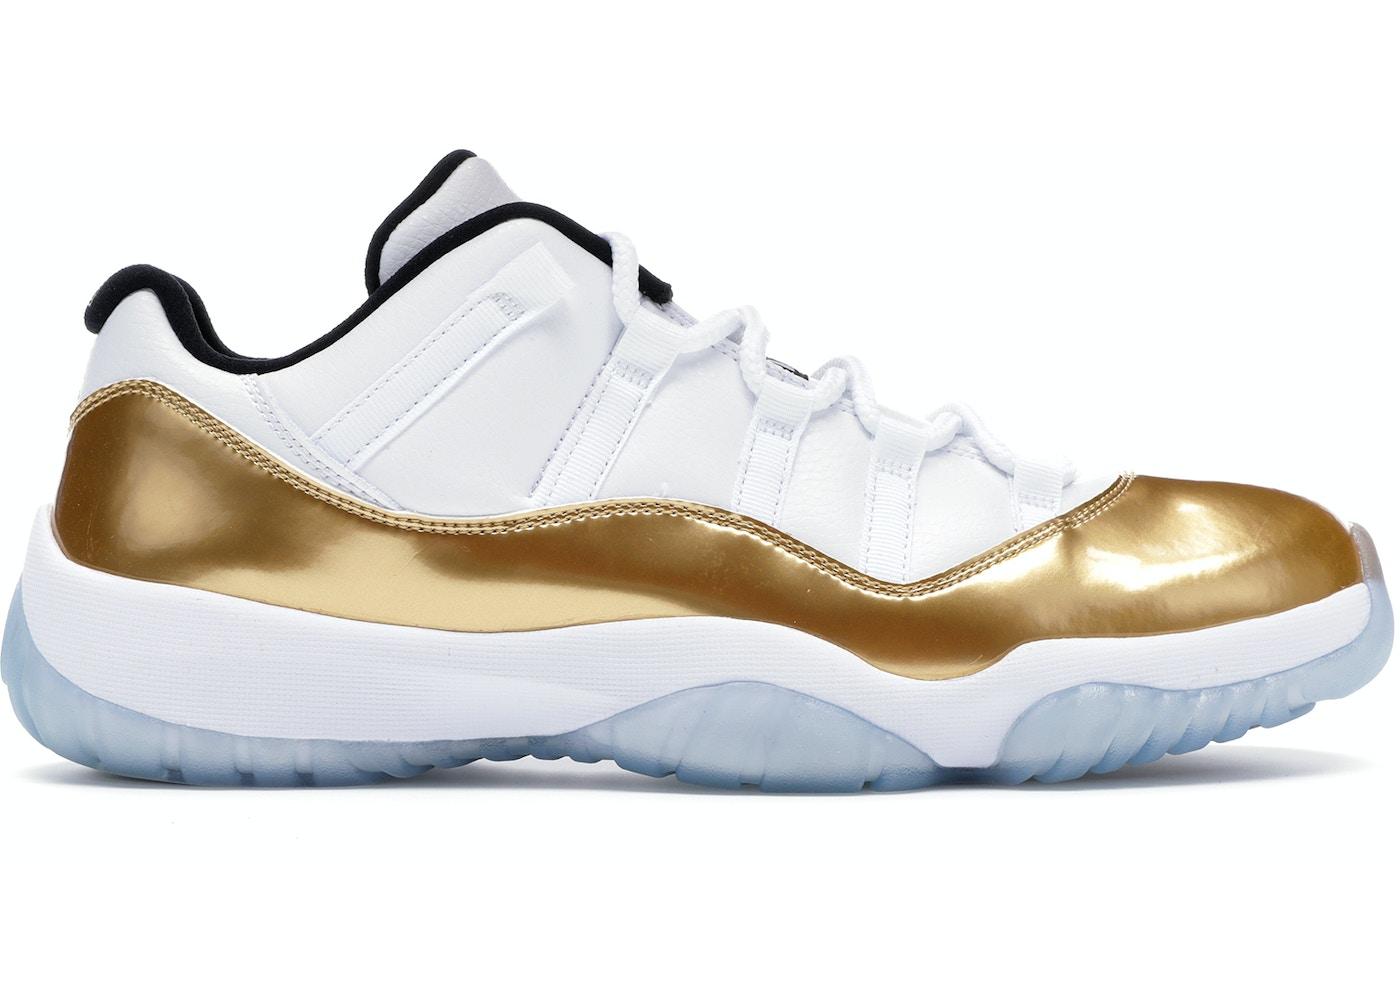 a97652e45c6 Buy Air Jordan 11 Shoes   Deadstock Sneakers